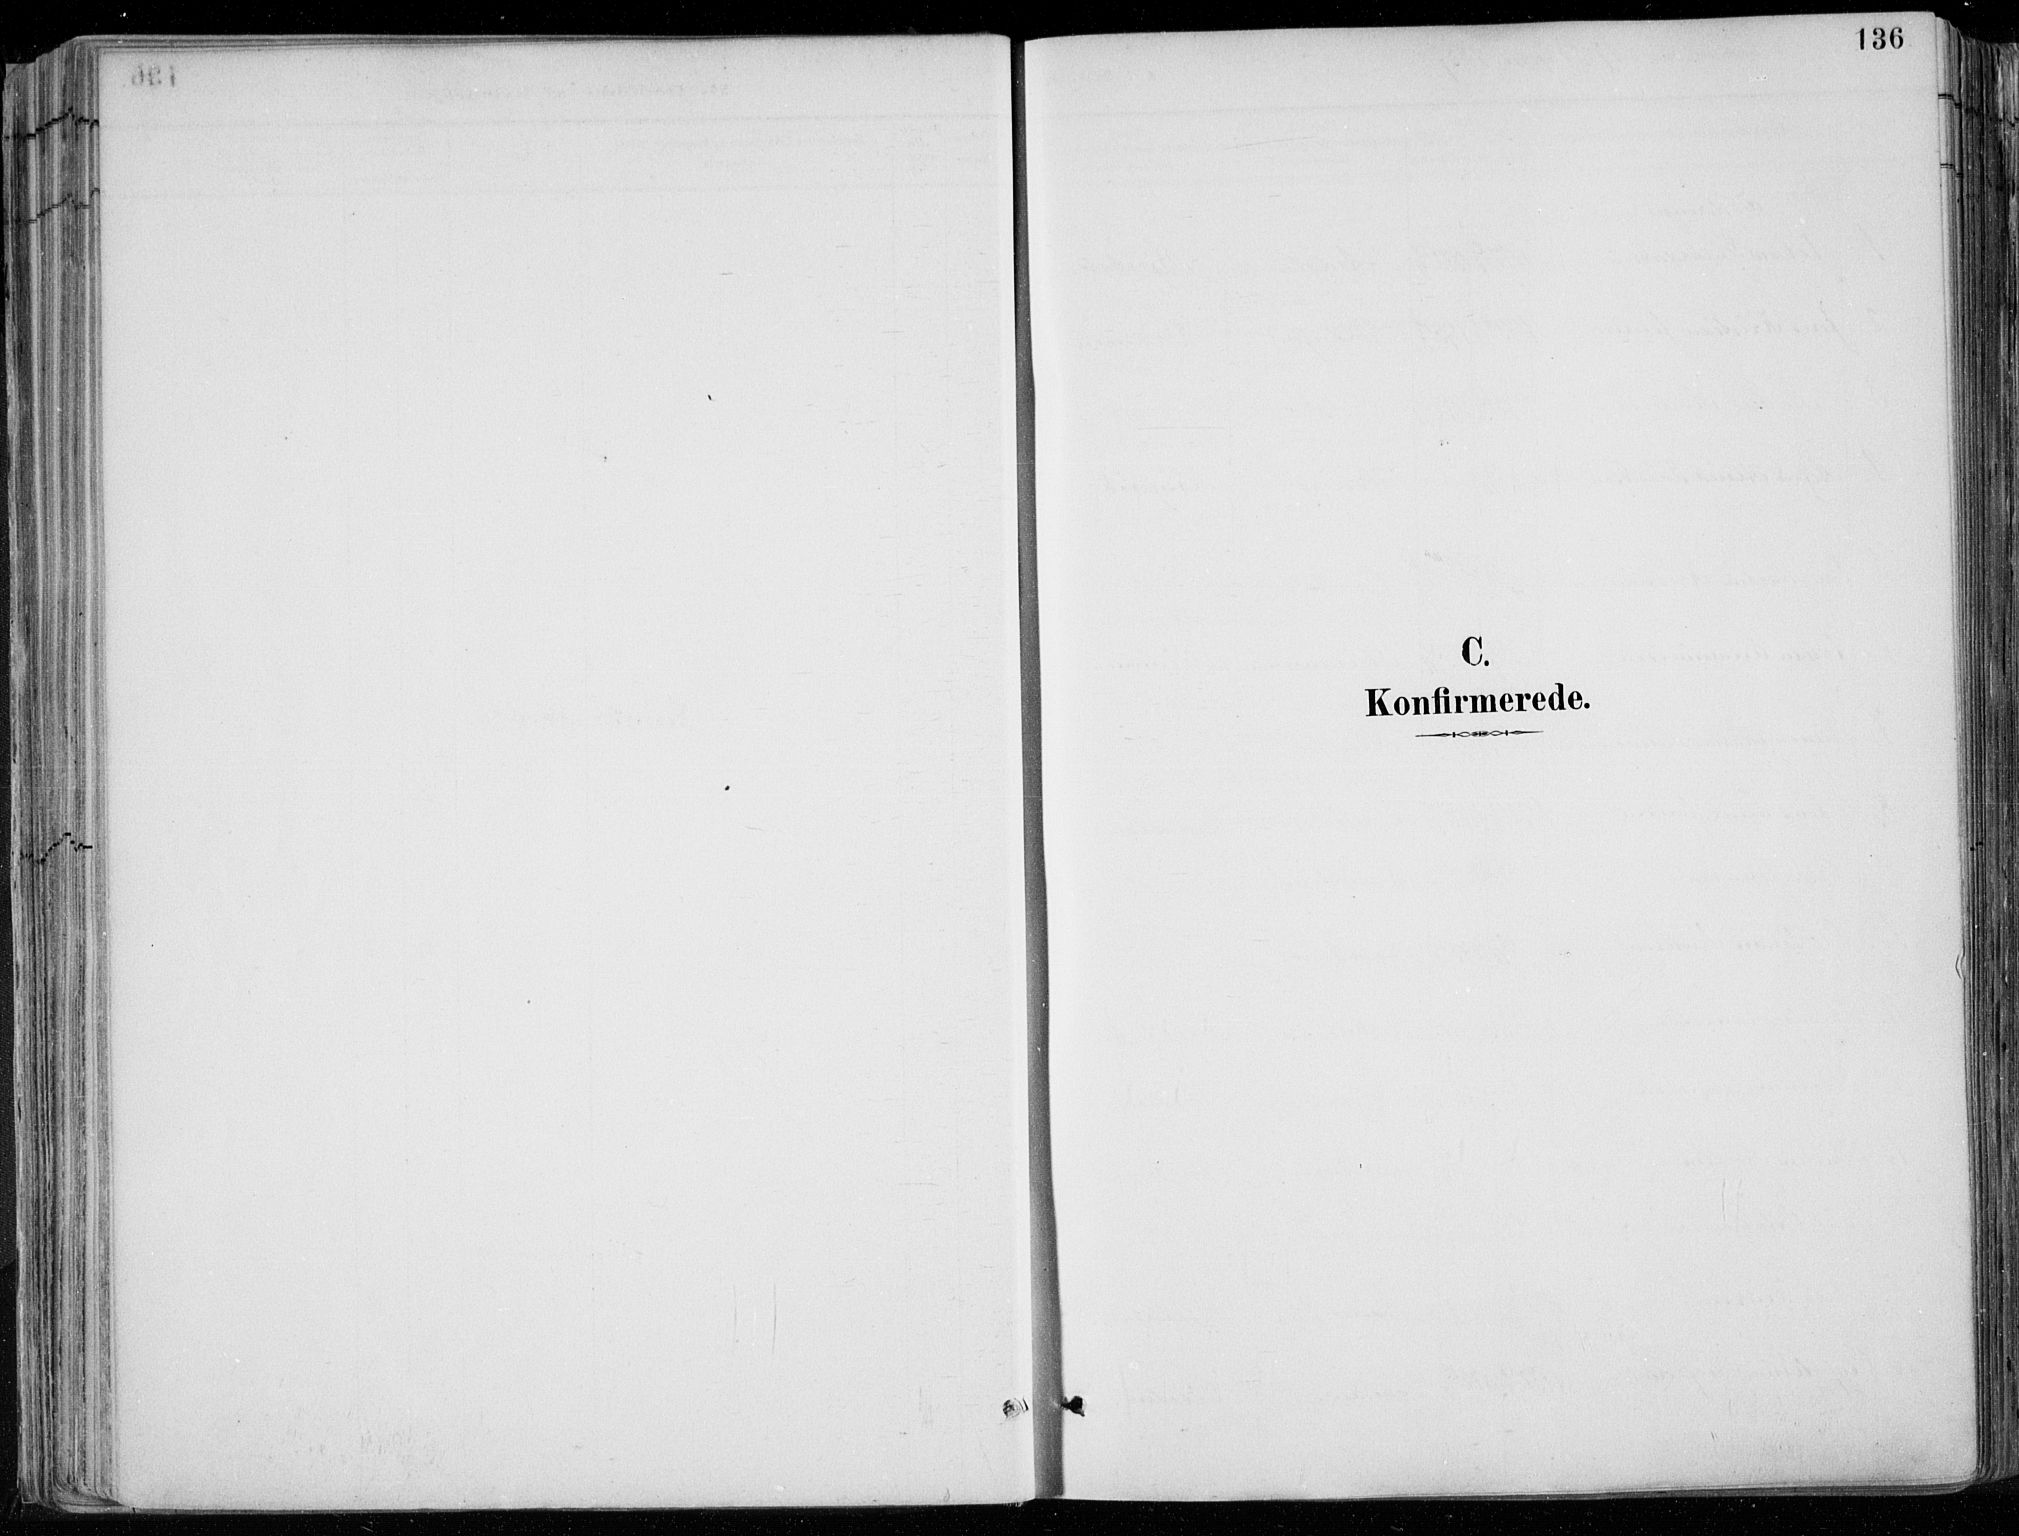 SAK, Øyestad sokneprestkontor, F/Fa/L0017: Ministerialbok nr. A 17, 1887-1896, s. 136